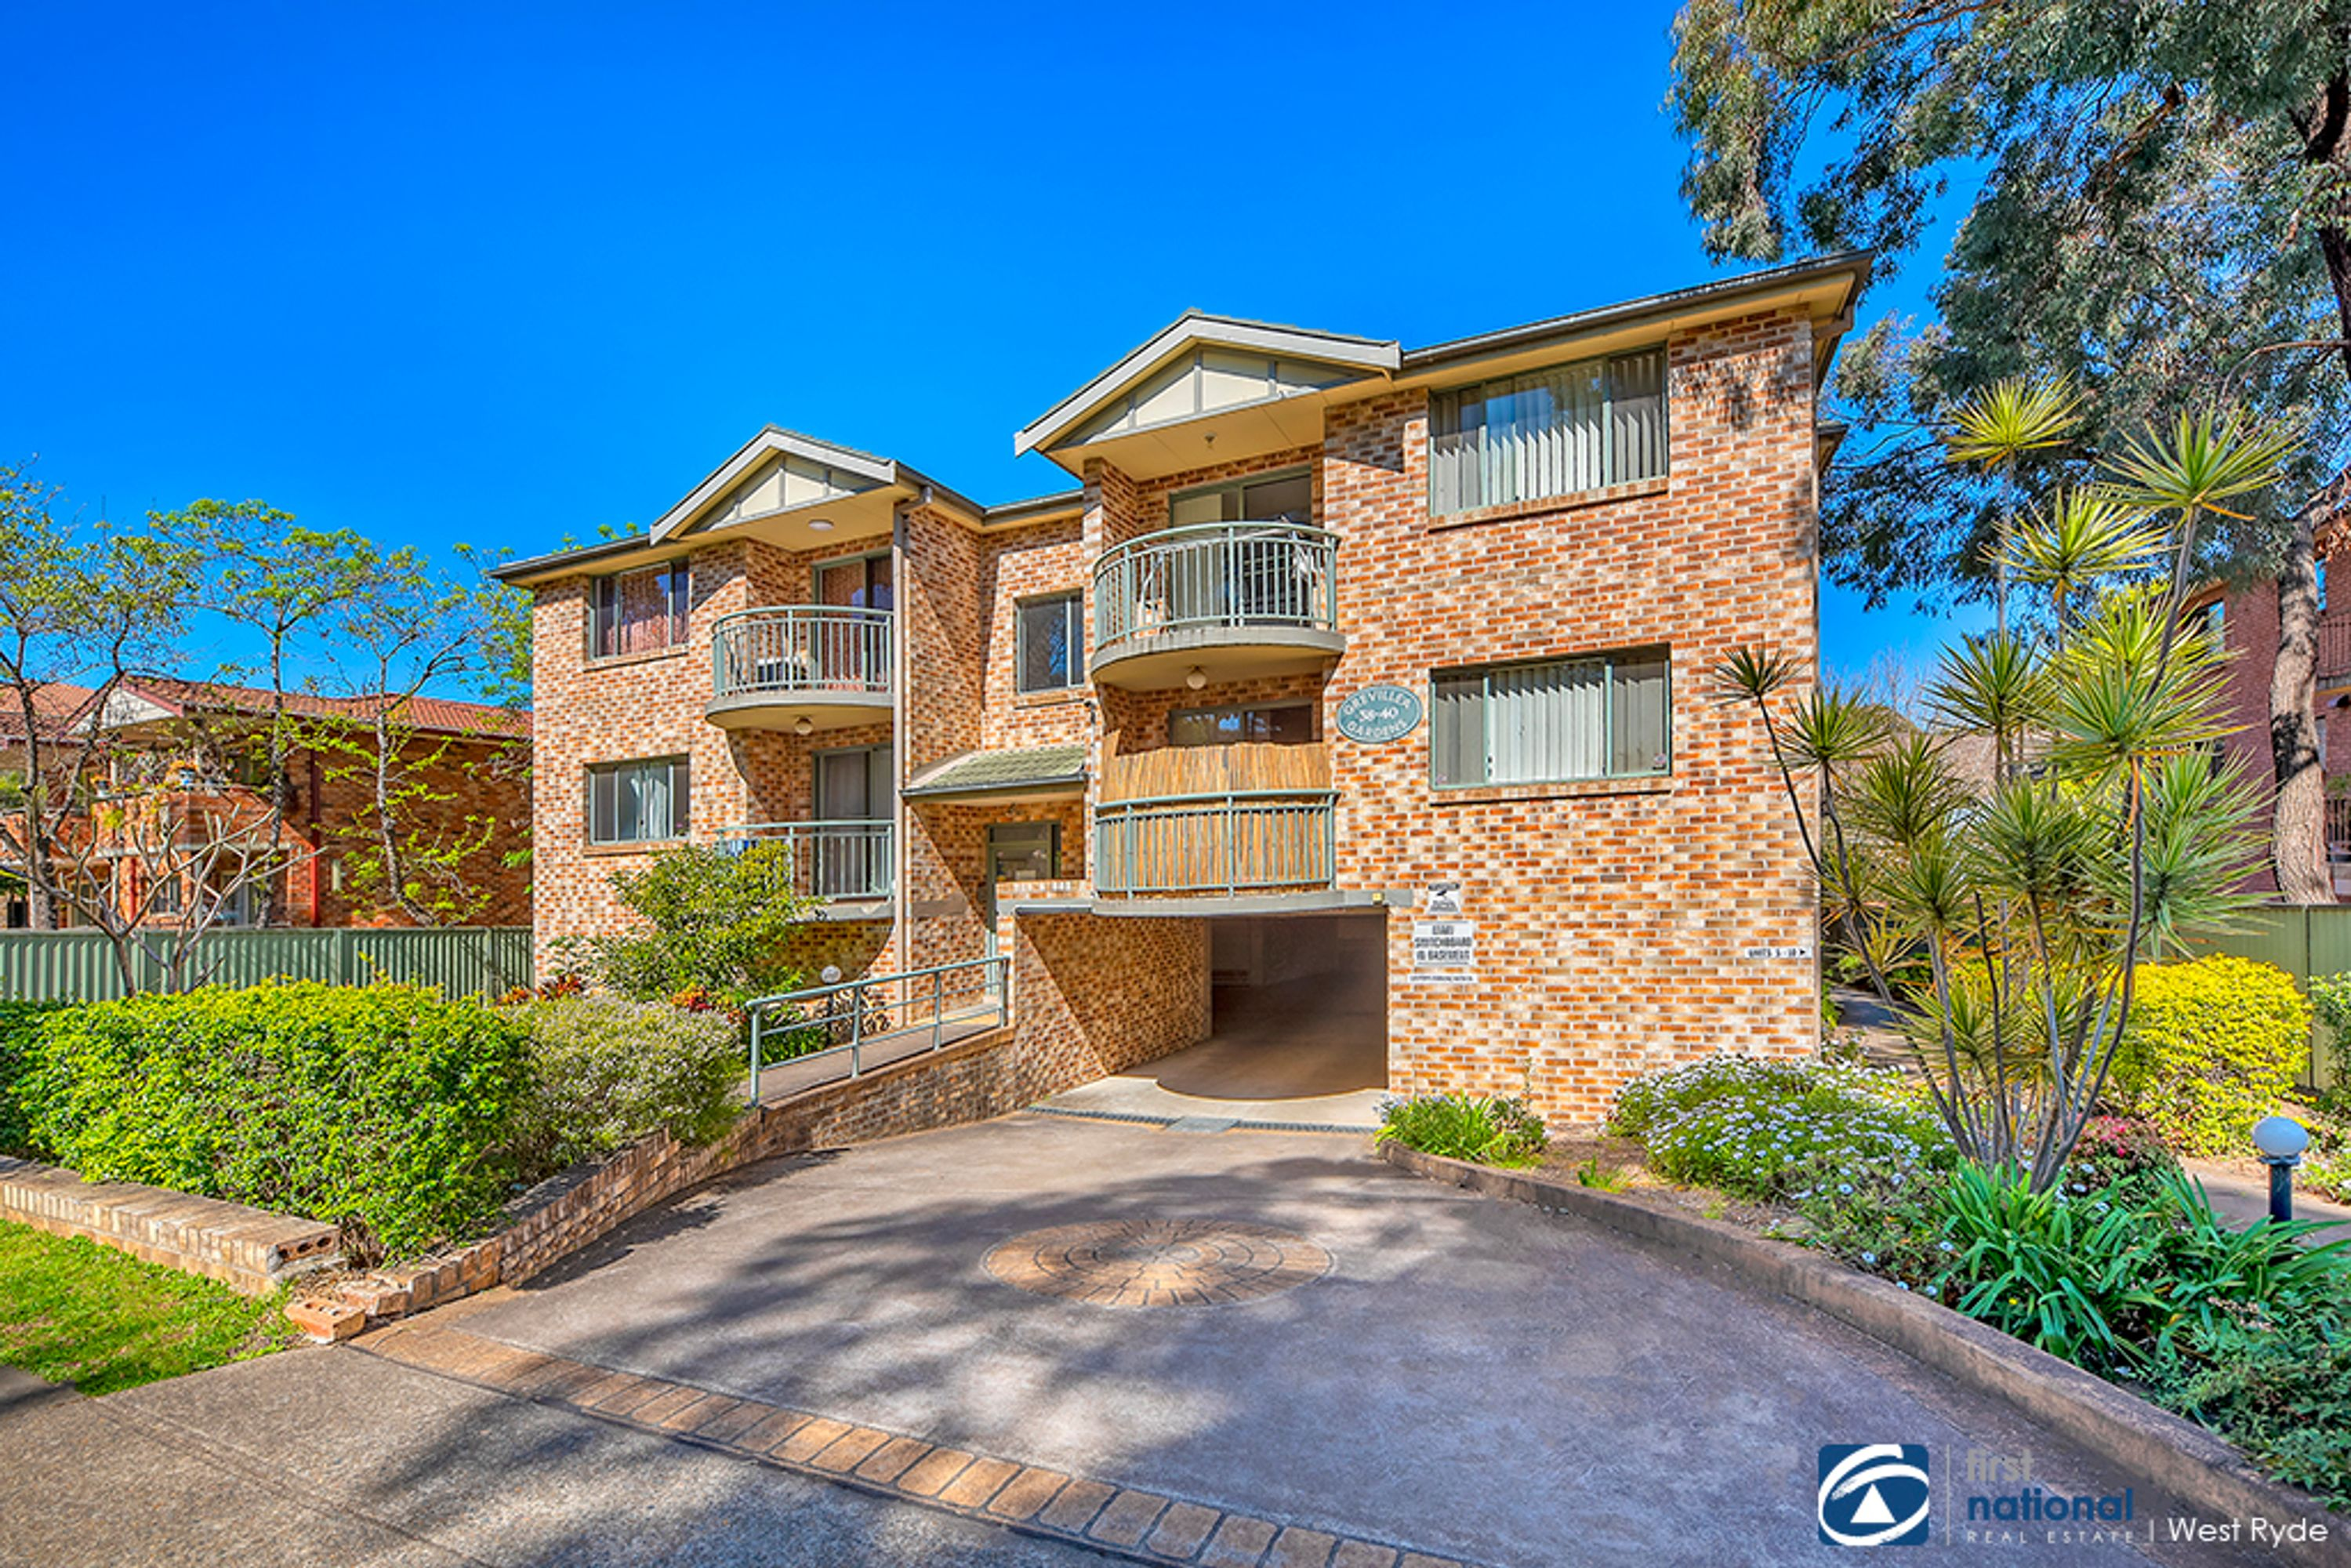 9/38-40 Meehan Street, Granville, NSW 2142